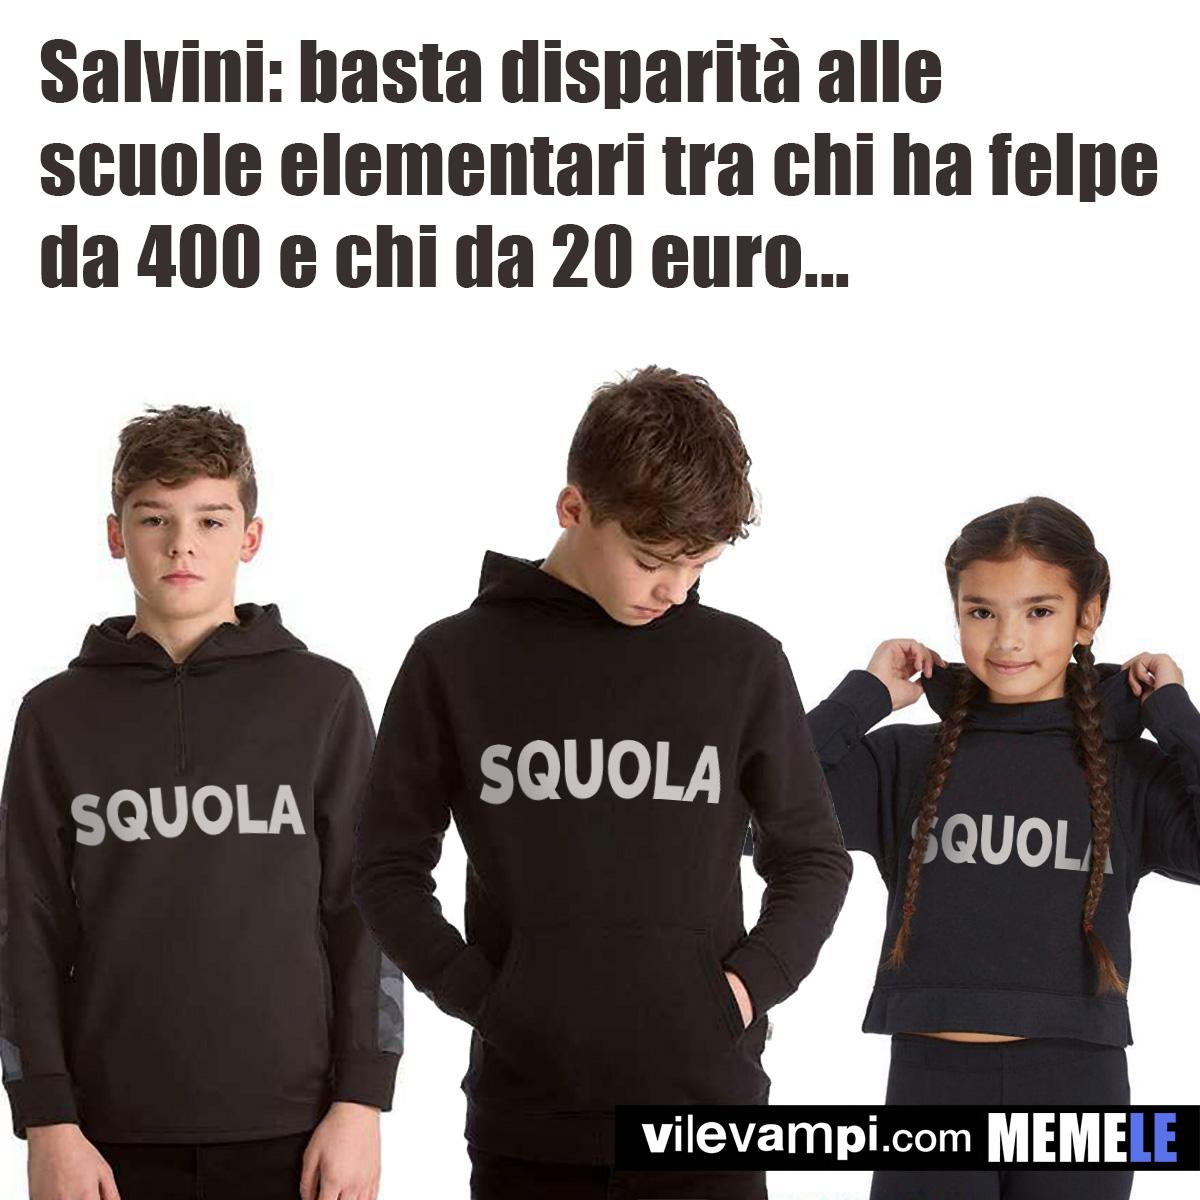 2019_Meme_Squola